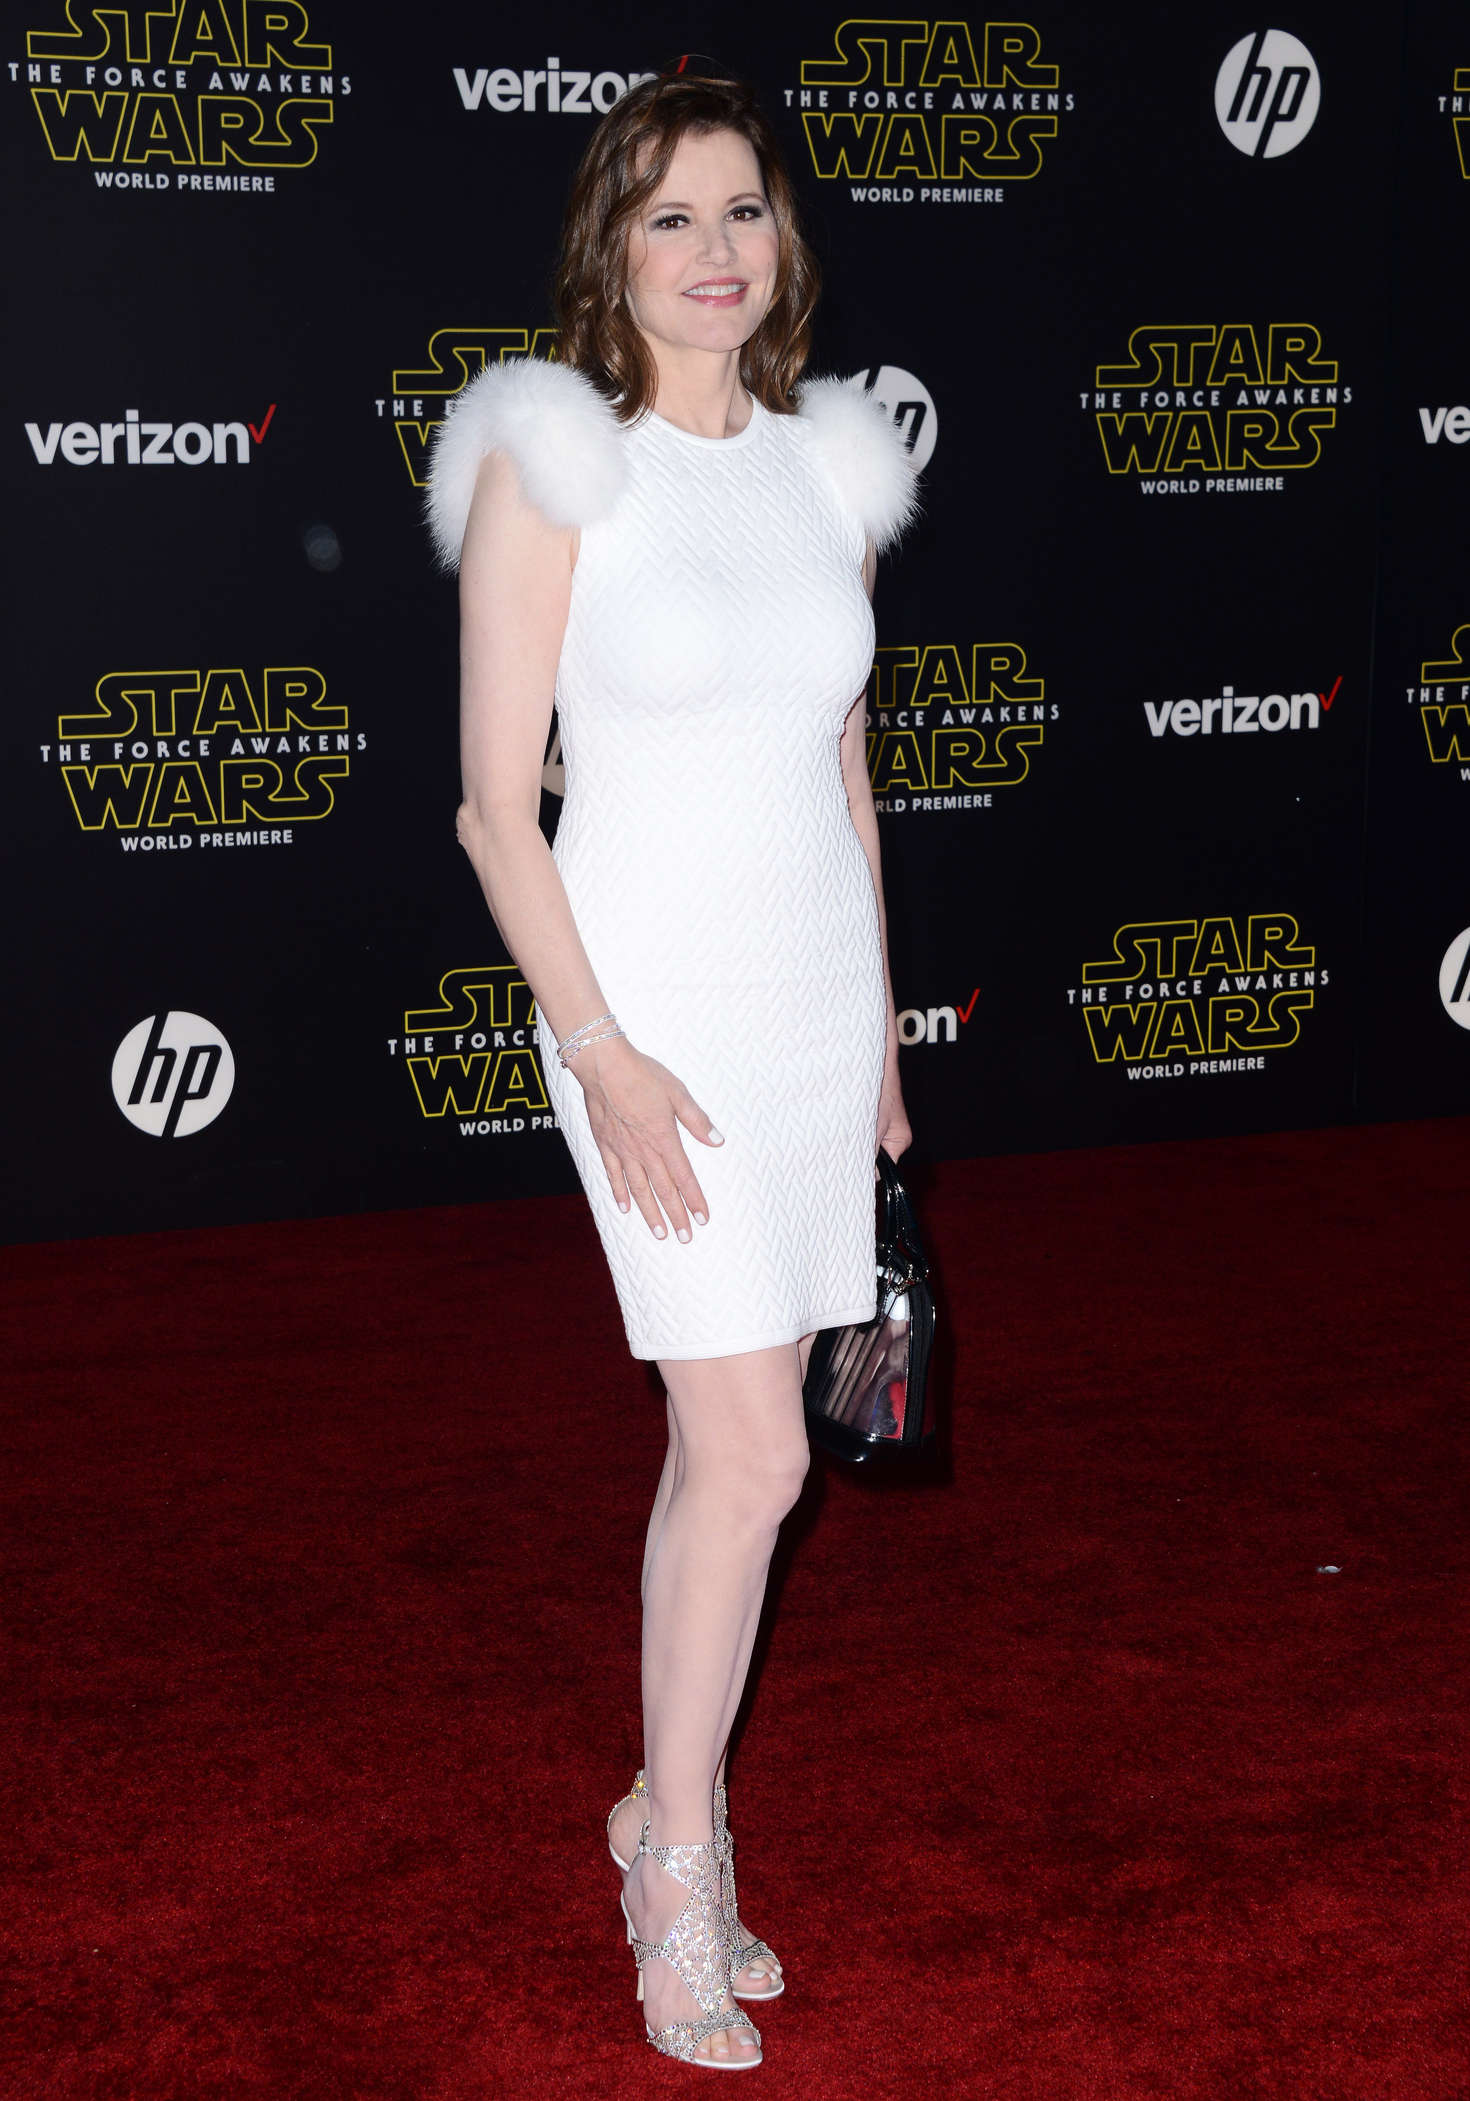 Geena Davis Star Wars The Force Awakens Premiere in Hollywood